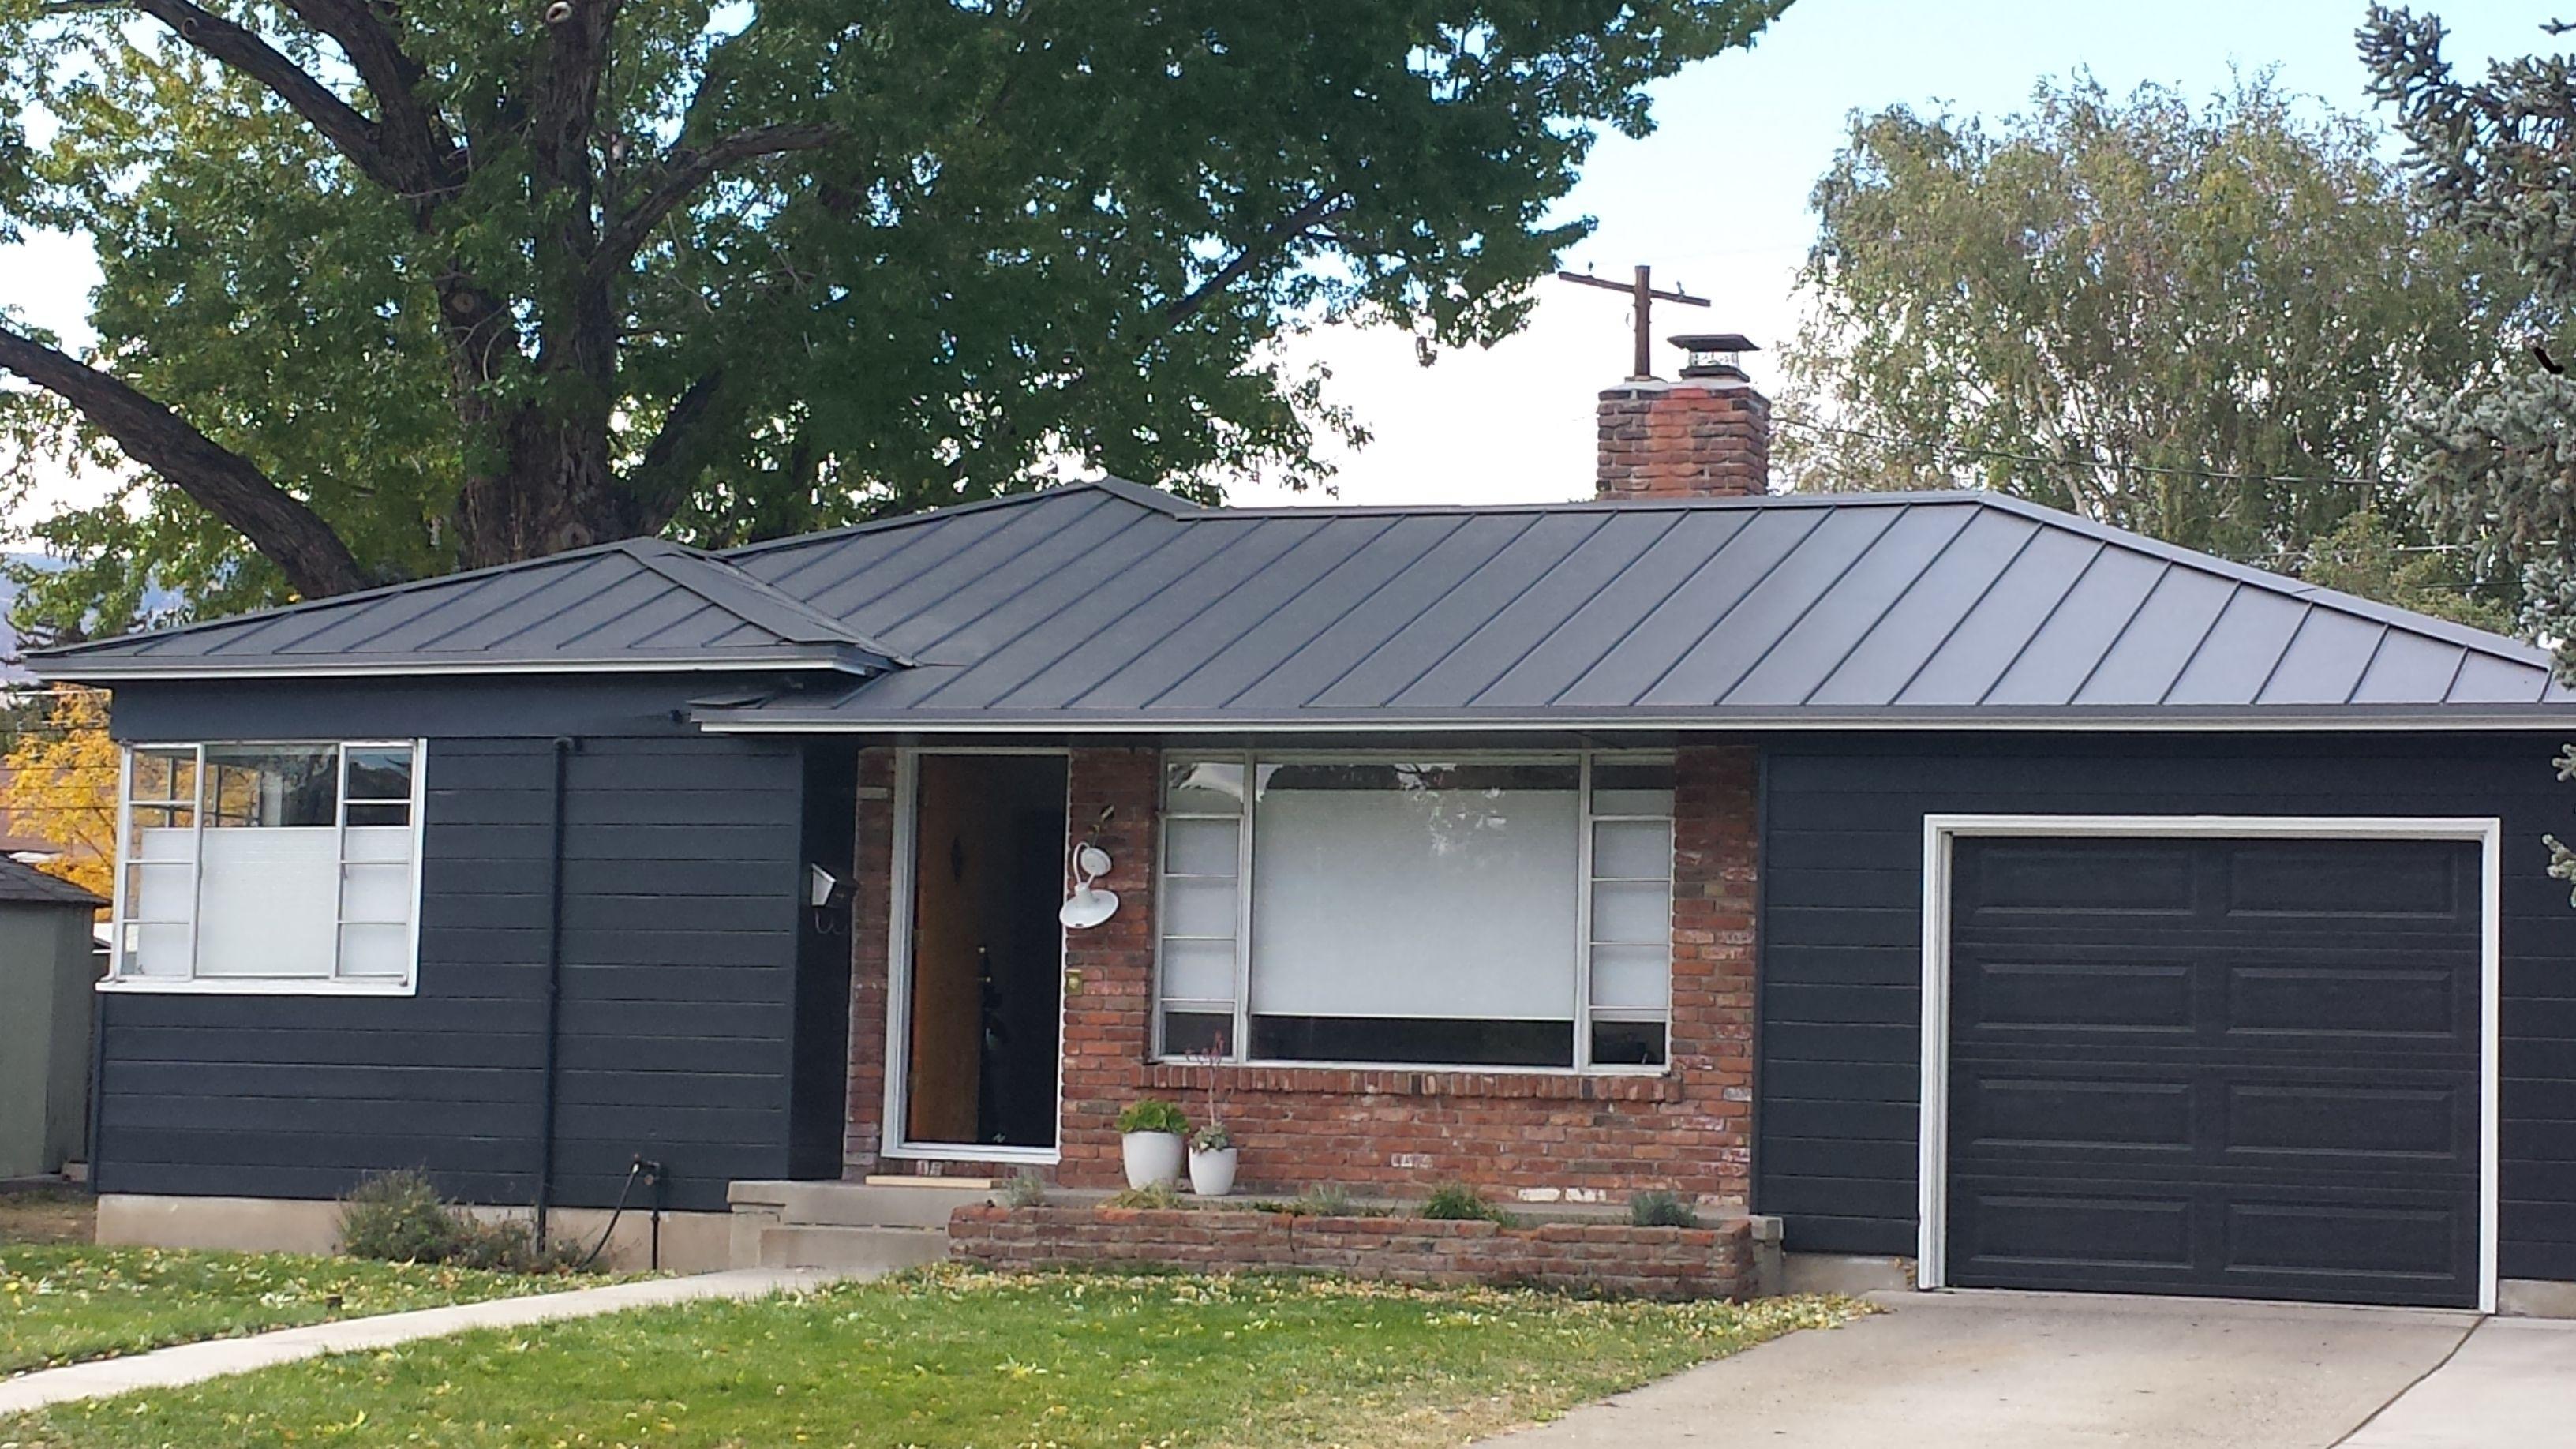 Standing Seam Metal Roof True Green Roofing Reno Nv Best Solar Panels Solar Roof Shingles Solar Panels